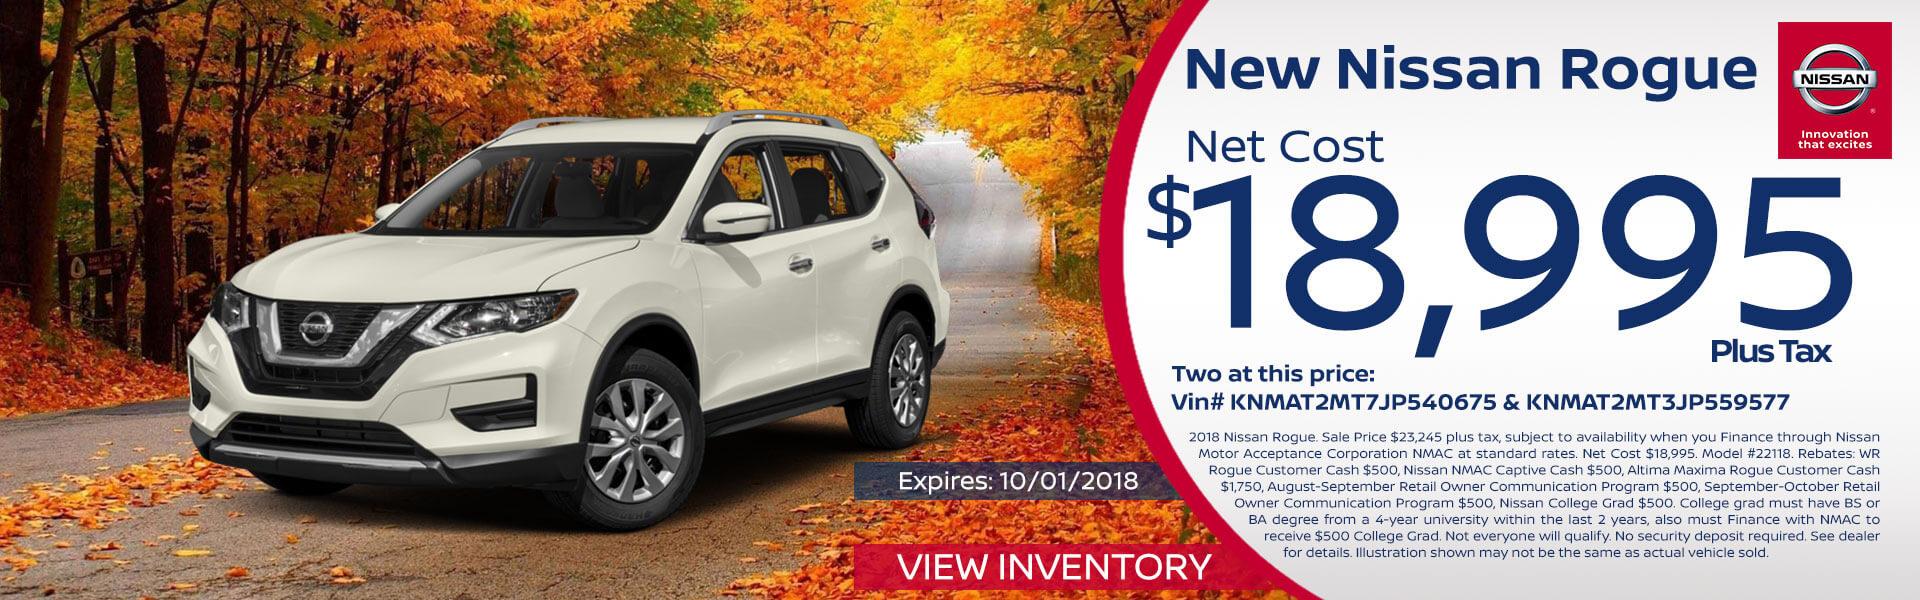 New Nissan Dealer Glendale Simi Valley San Fernando